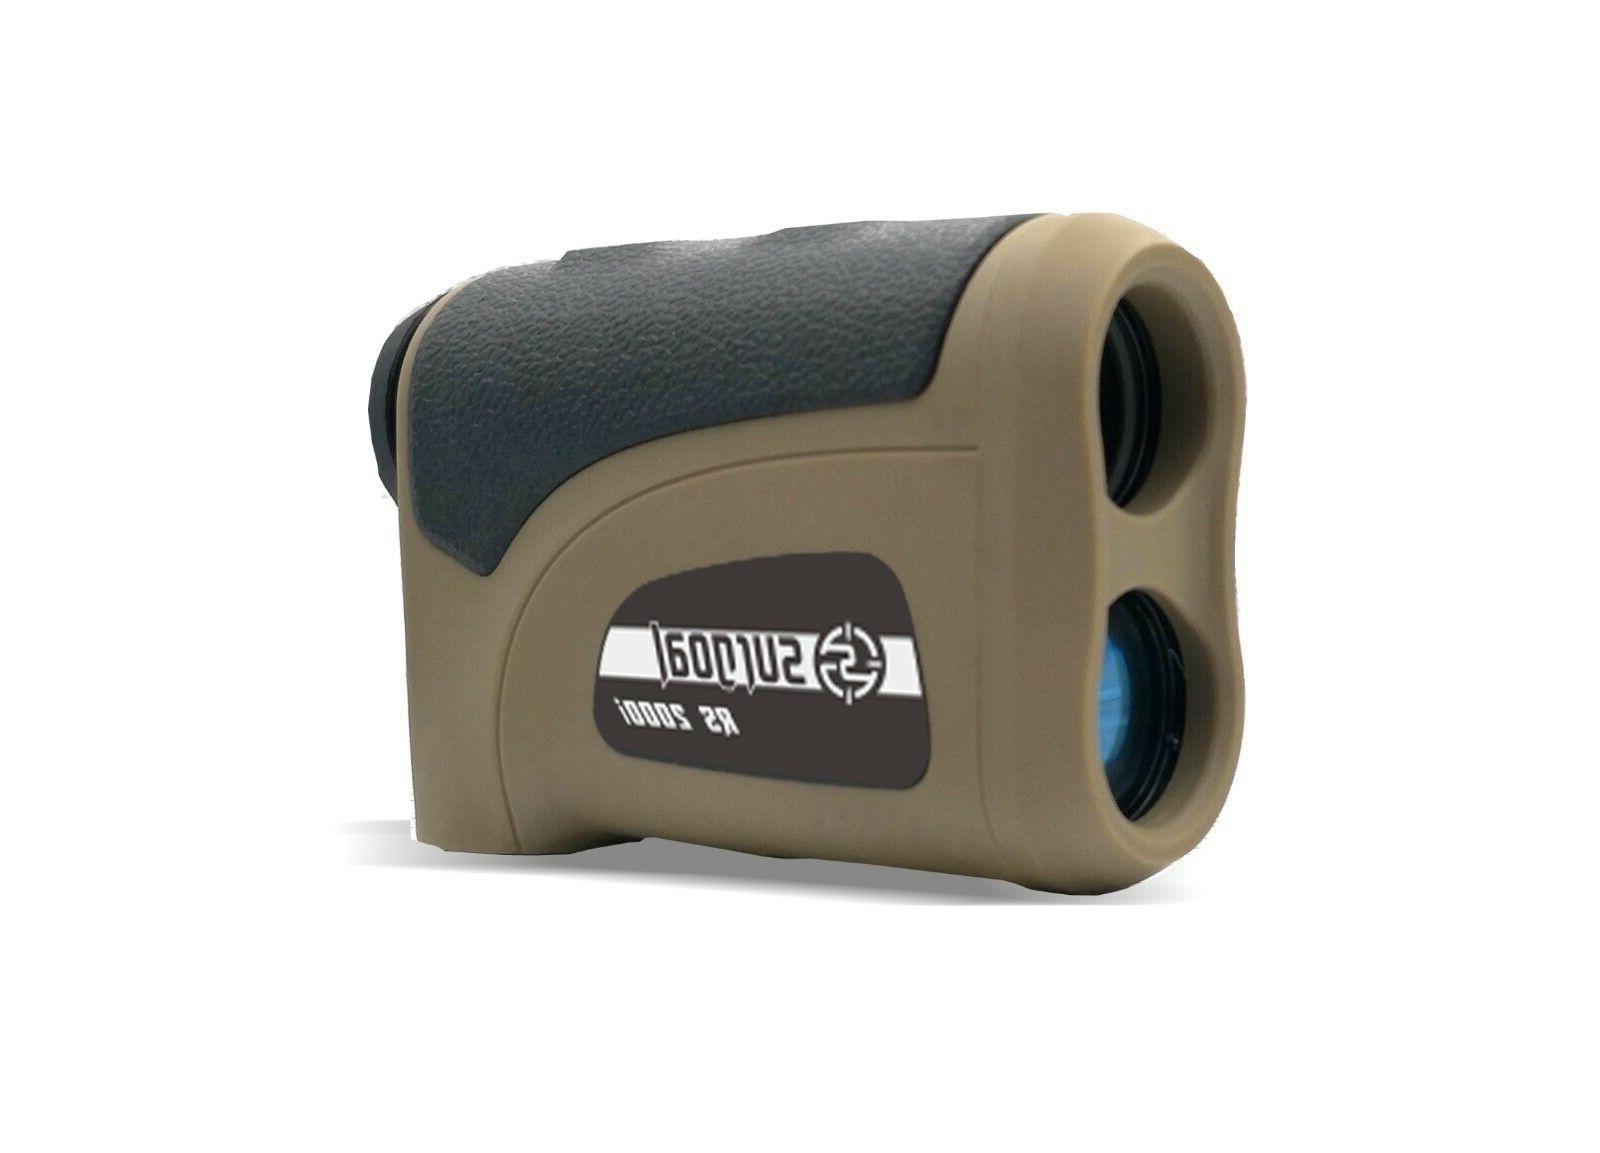 surgoal laser rangefinder rs2000i high accuracy 6x